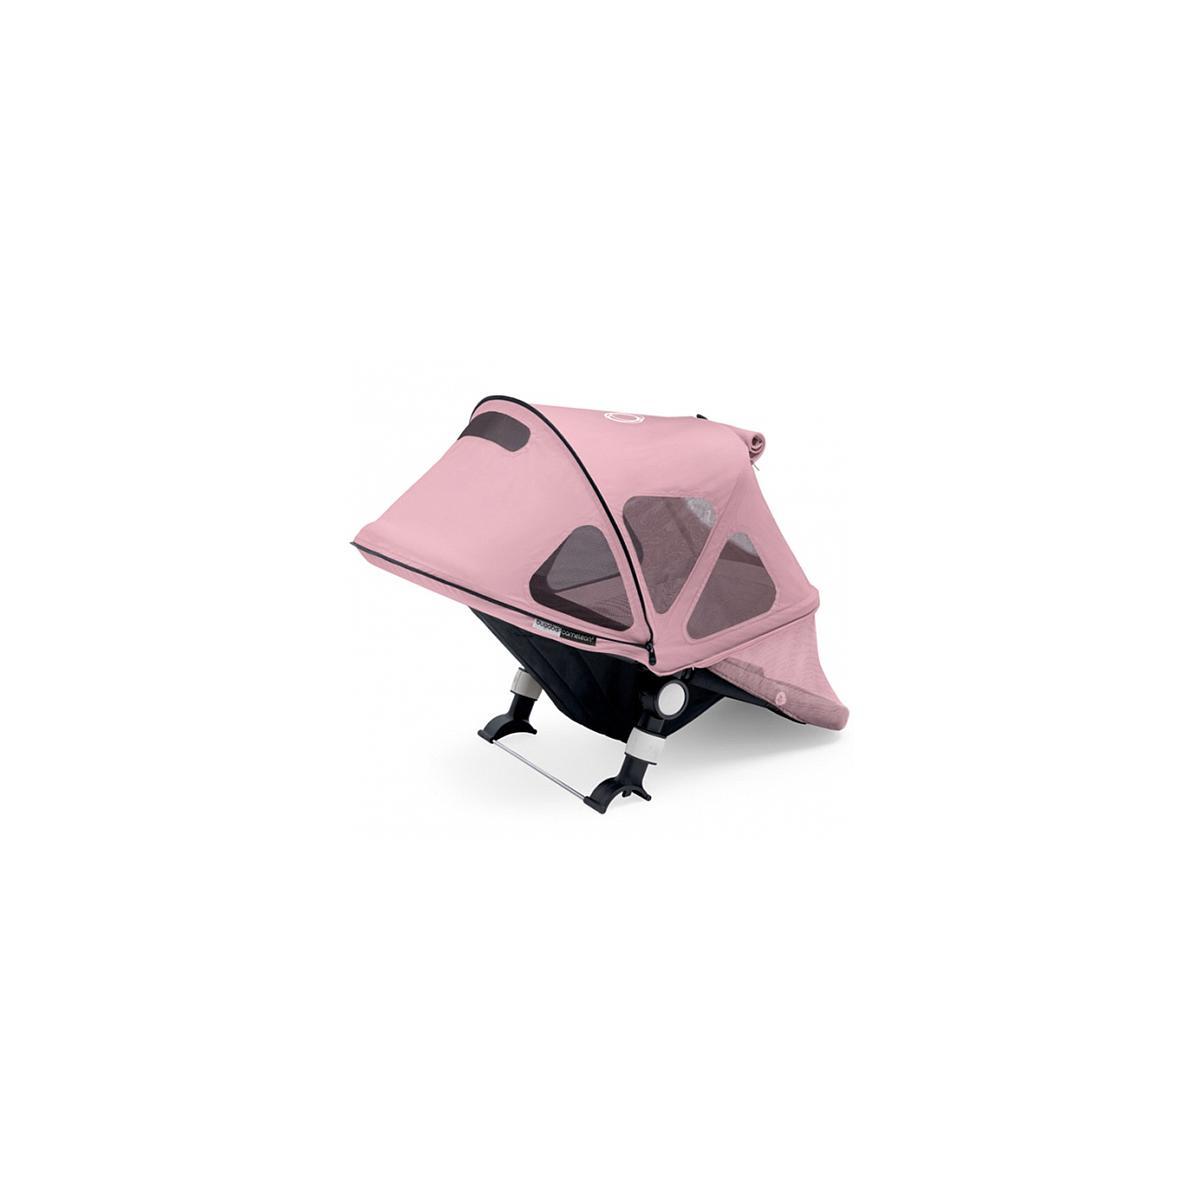 Capota ventilada Bugaboo BUFFALO-RUNNER rosa pastel